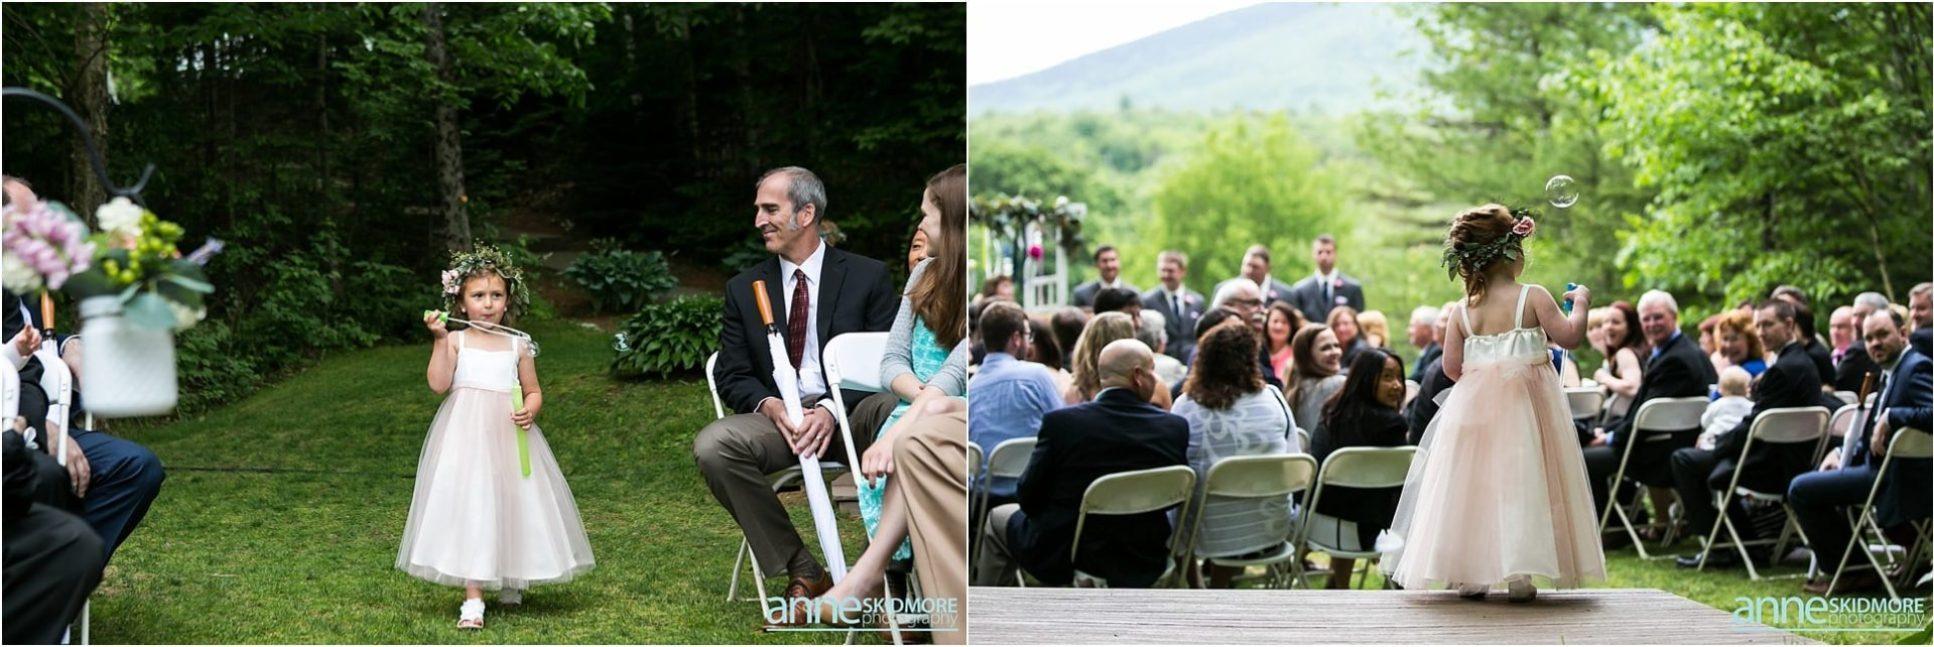 Eagle_Mountain_House_Wedding_0039